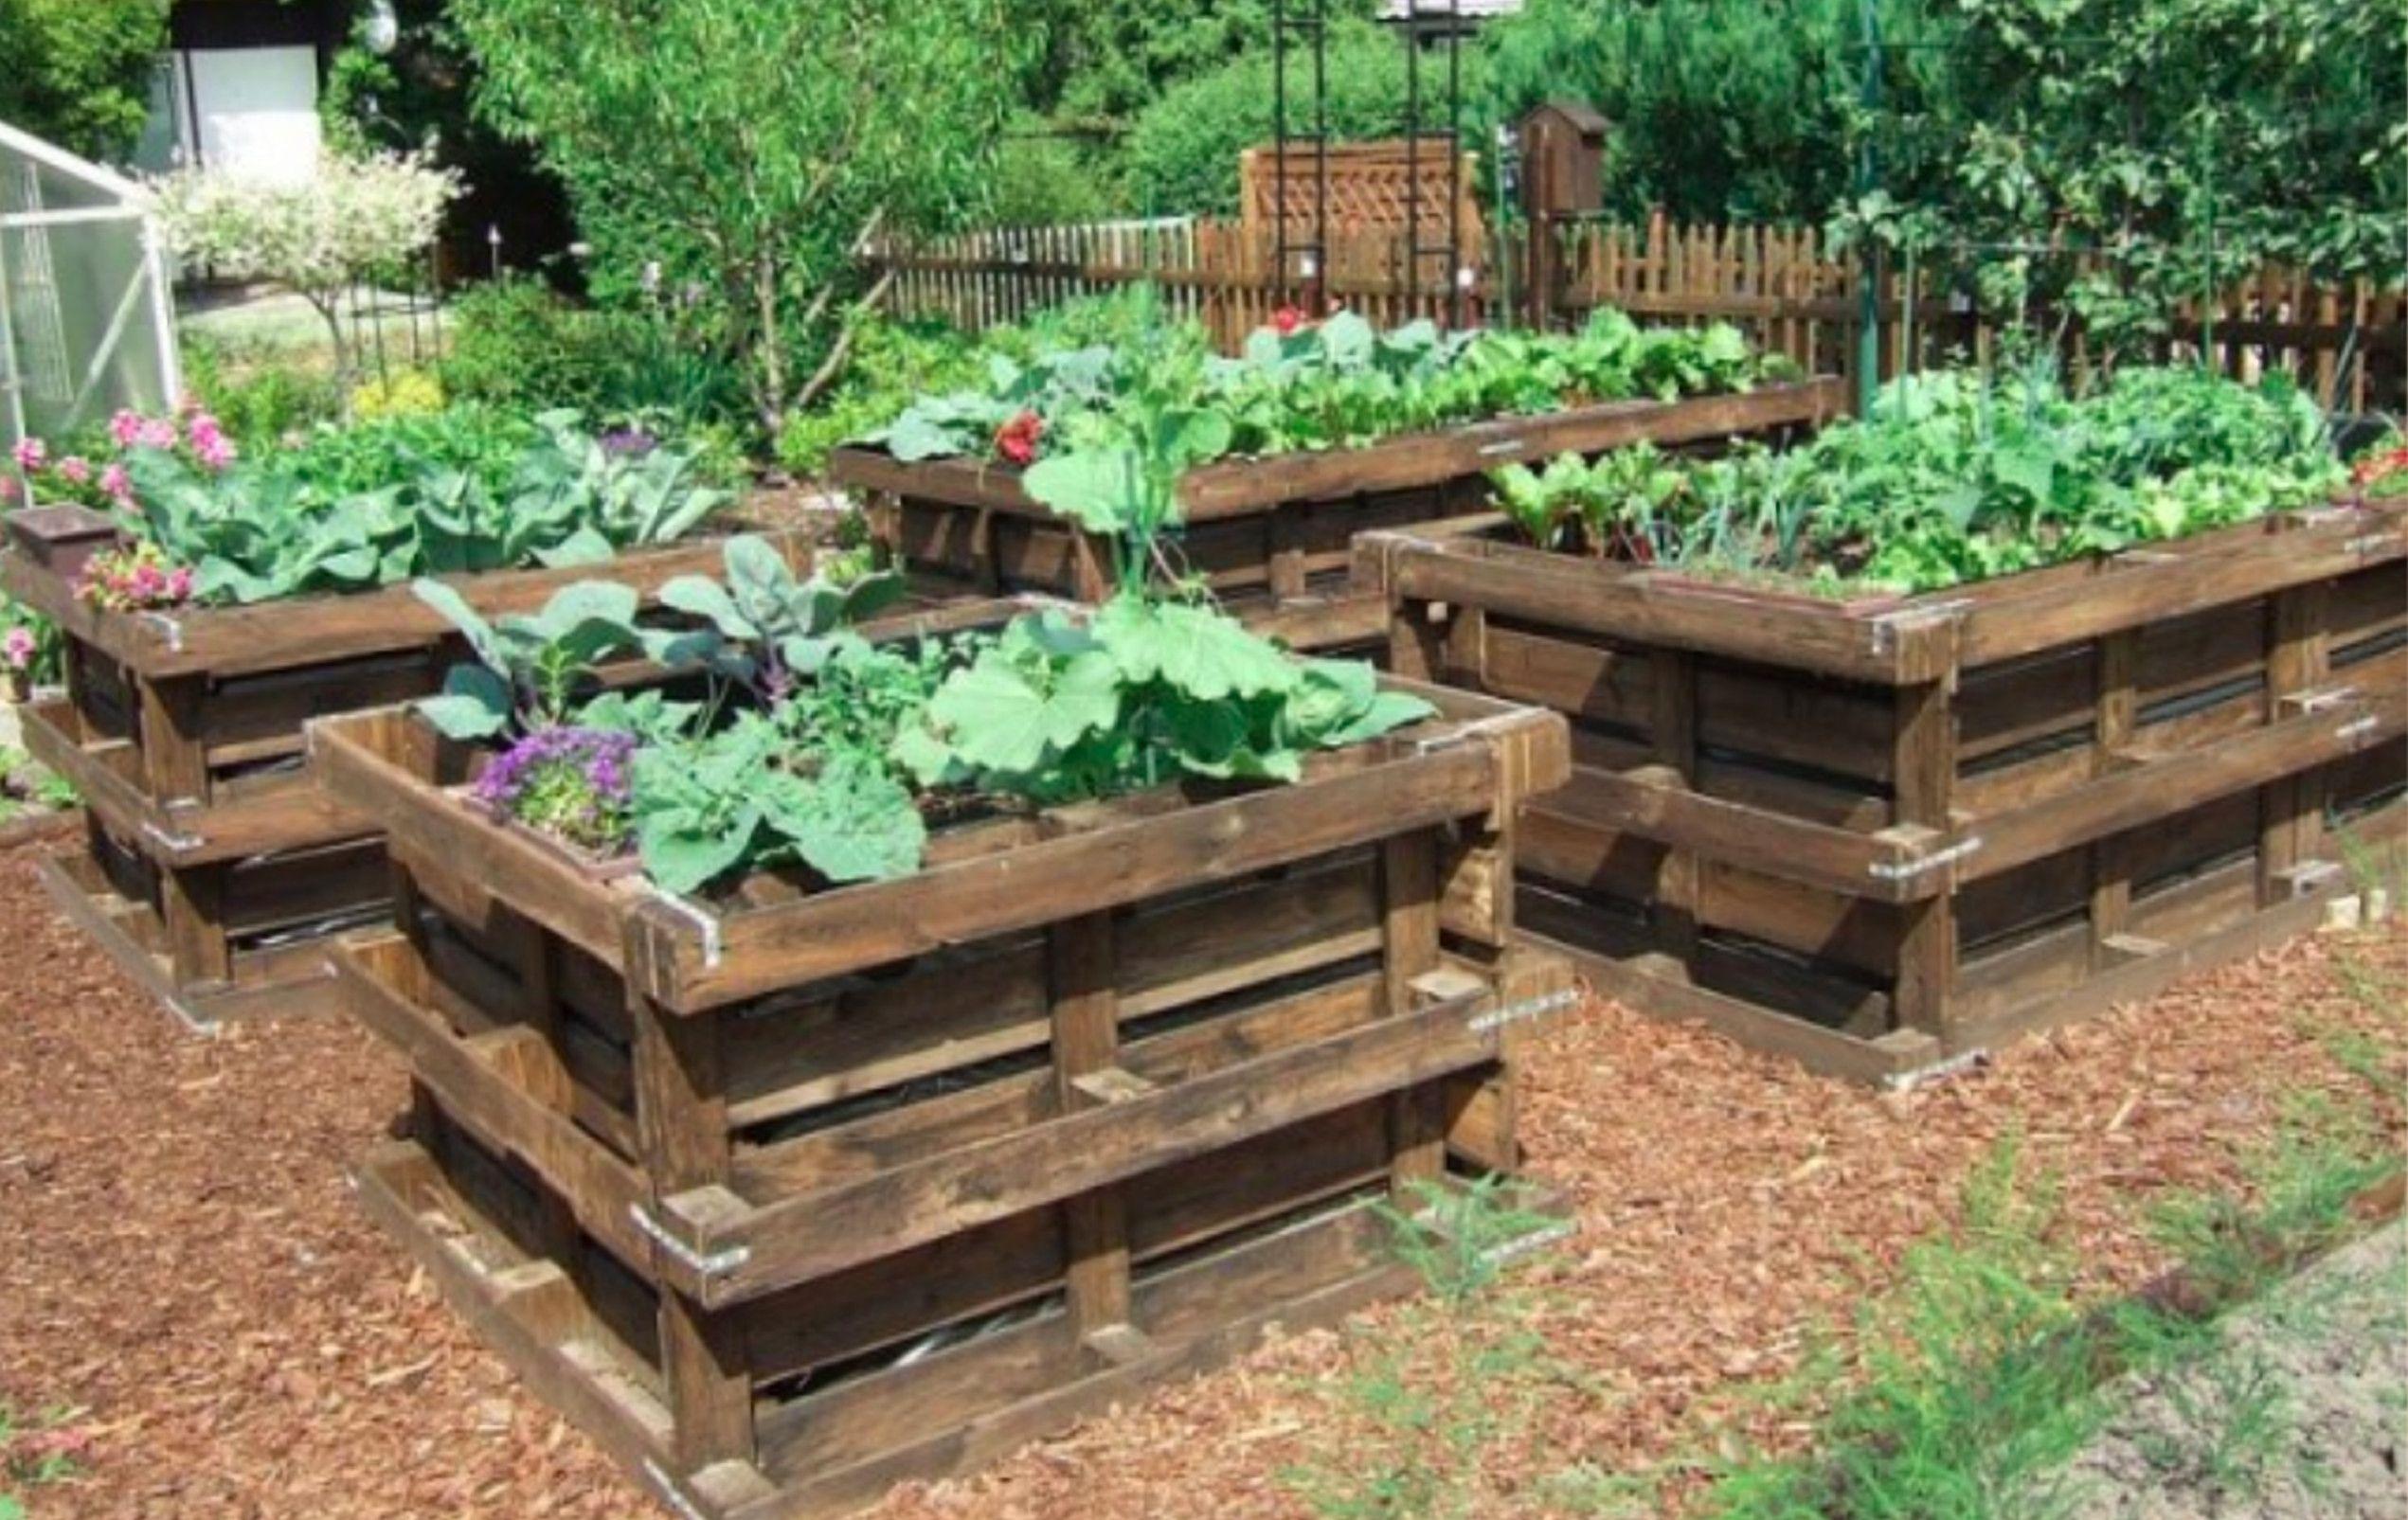 Diy Planter Box Ideas Luxury 10 Wood Pallet Ideas For The Garden